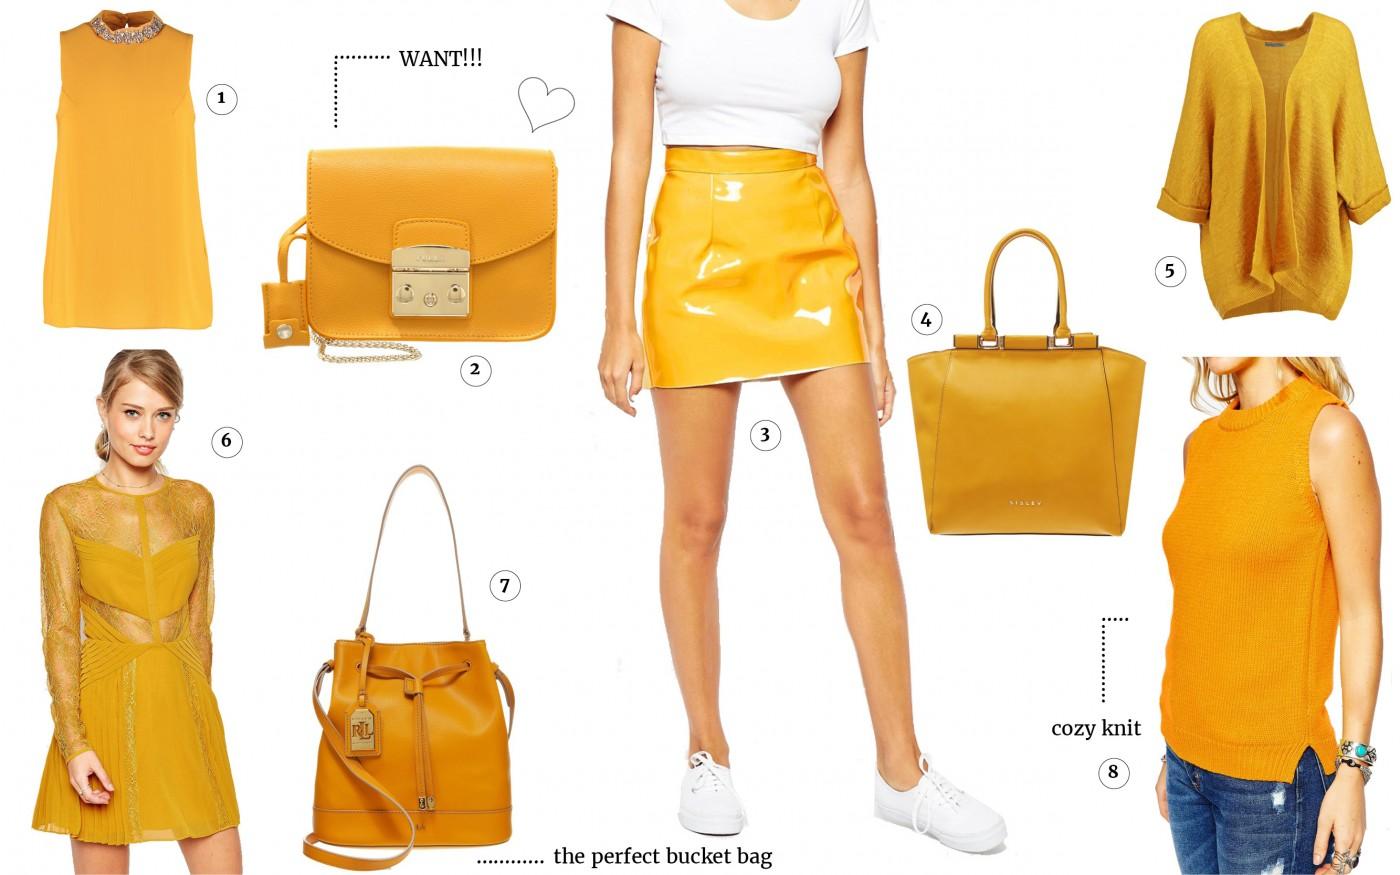 The Golden Bun | München Modeblog, German Fashion Blog, Fashionblogger, new trends, mustard yellow